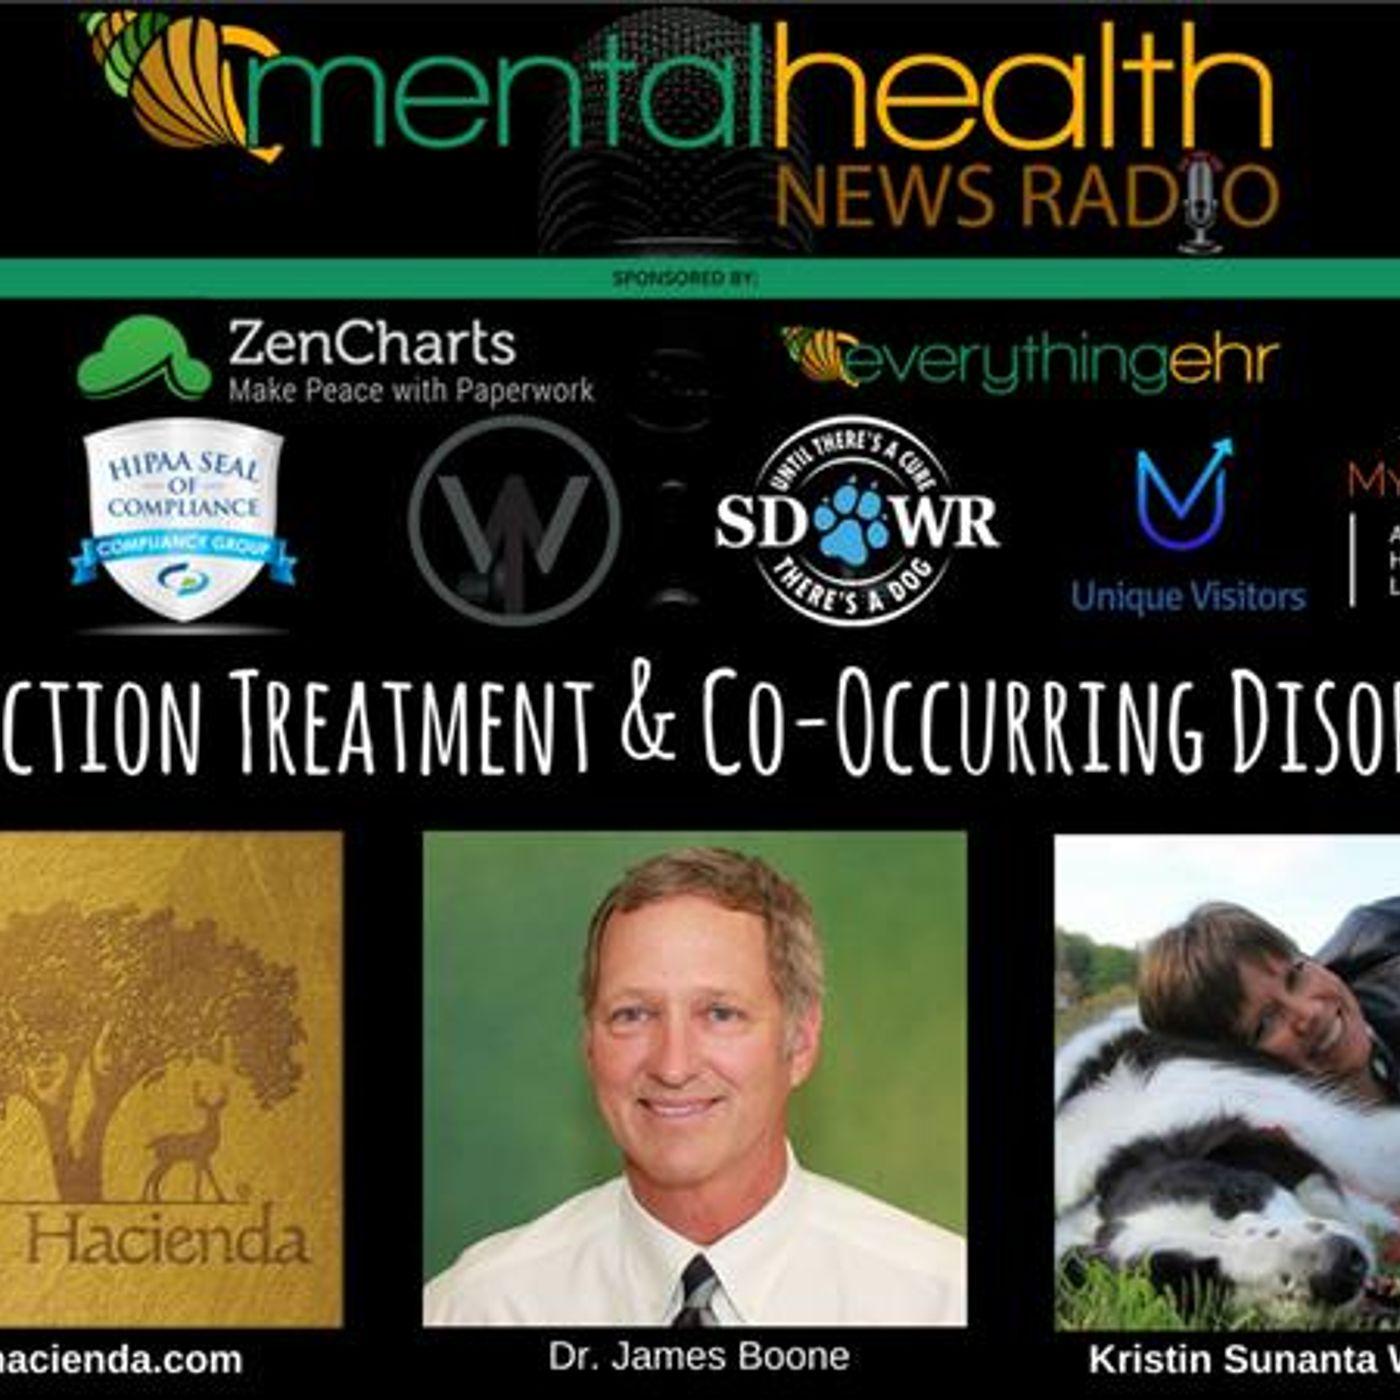 Mental Health News Radio - La Hacienda: Addiction Treatment & Co-Occurring Disorders with Dr. James Boone